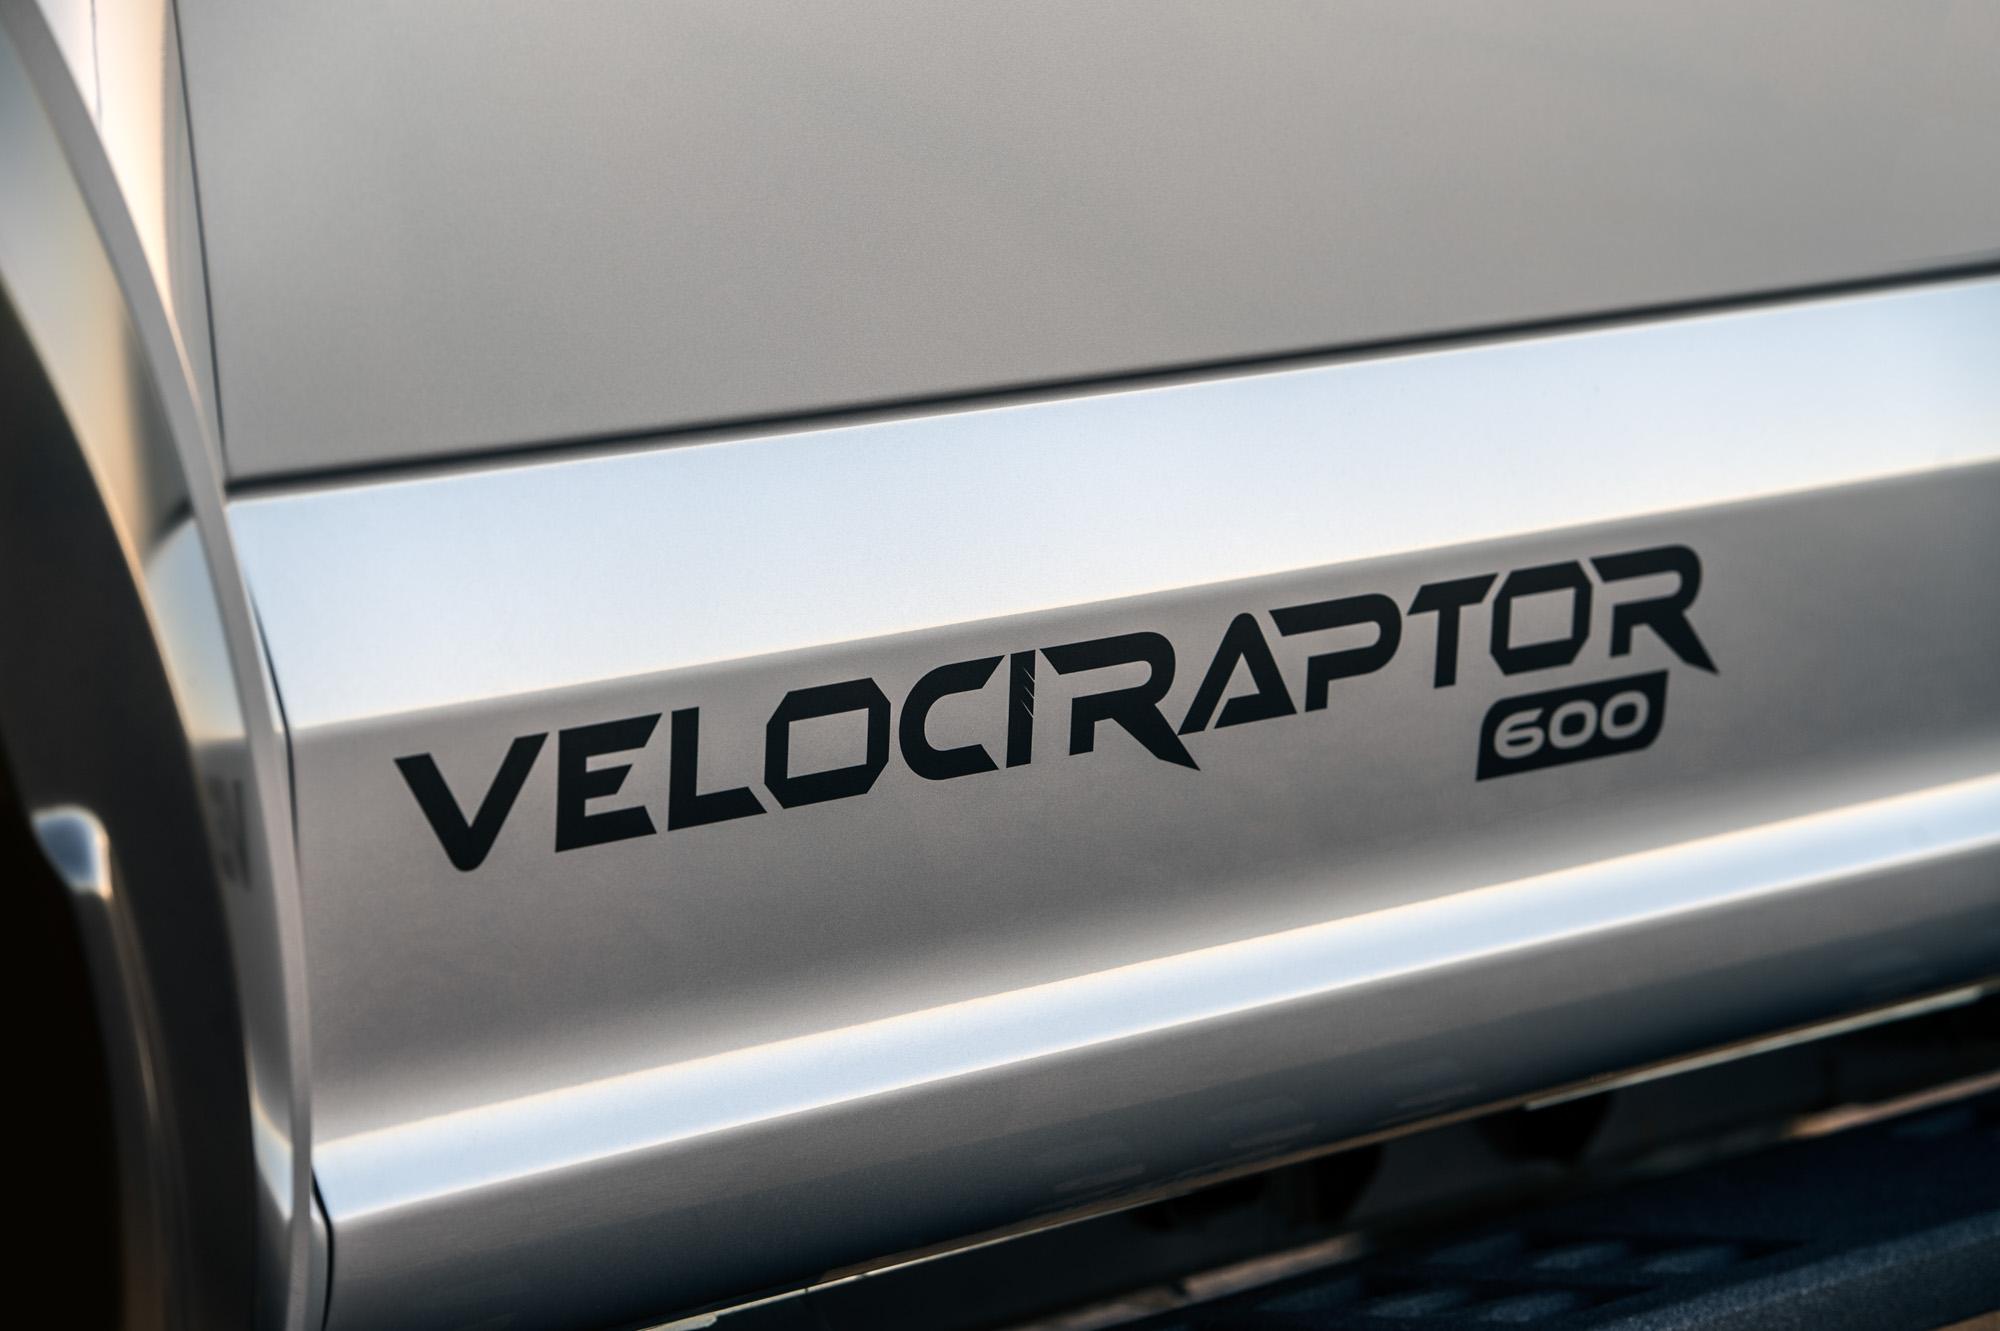 Velociraptor 600 vermelding op carrosserie